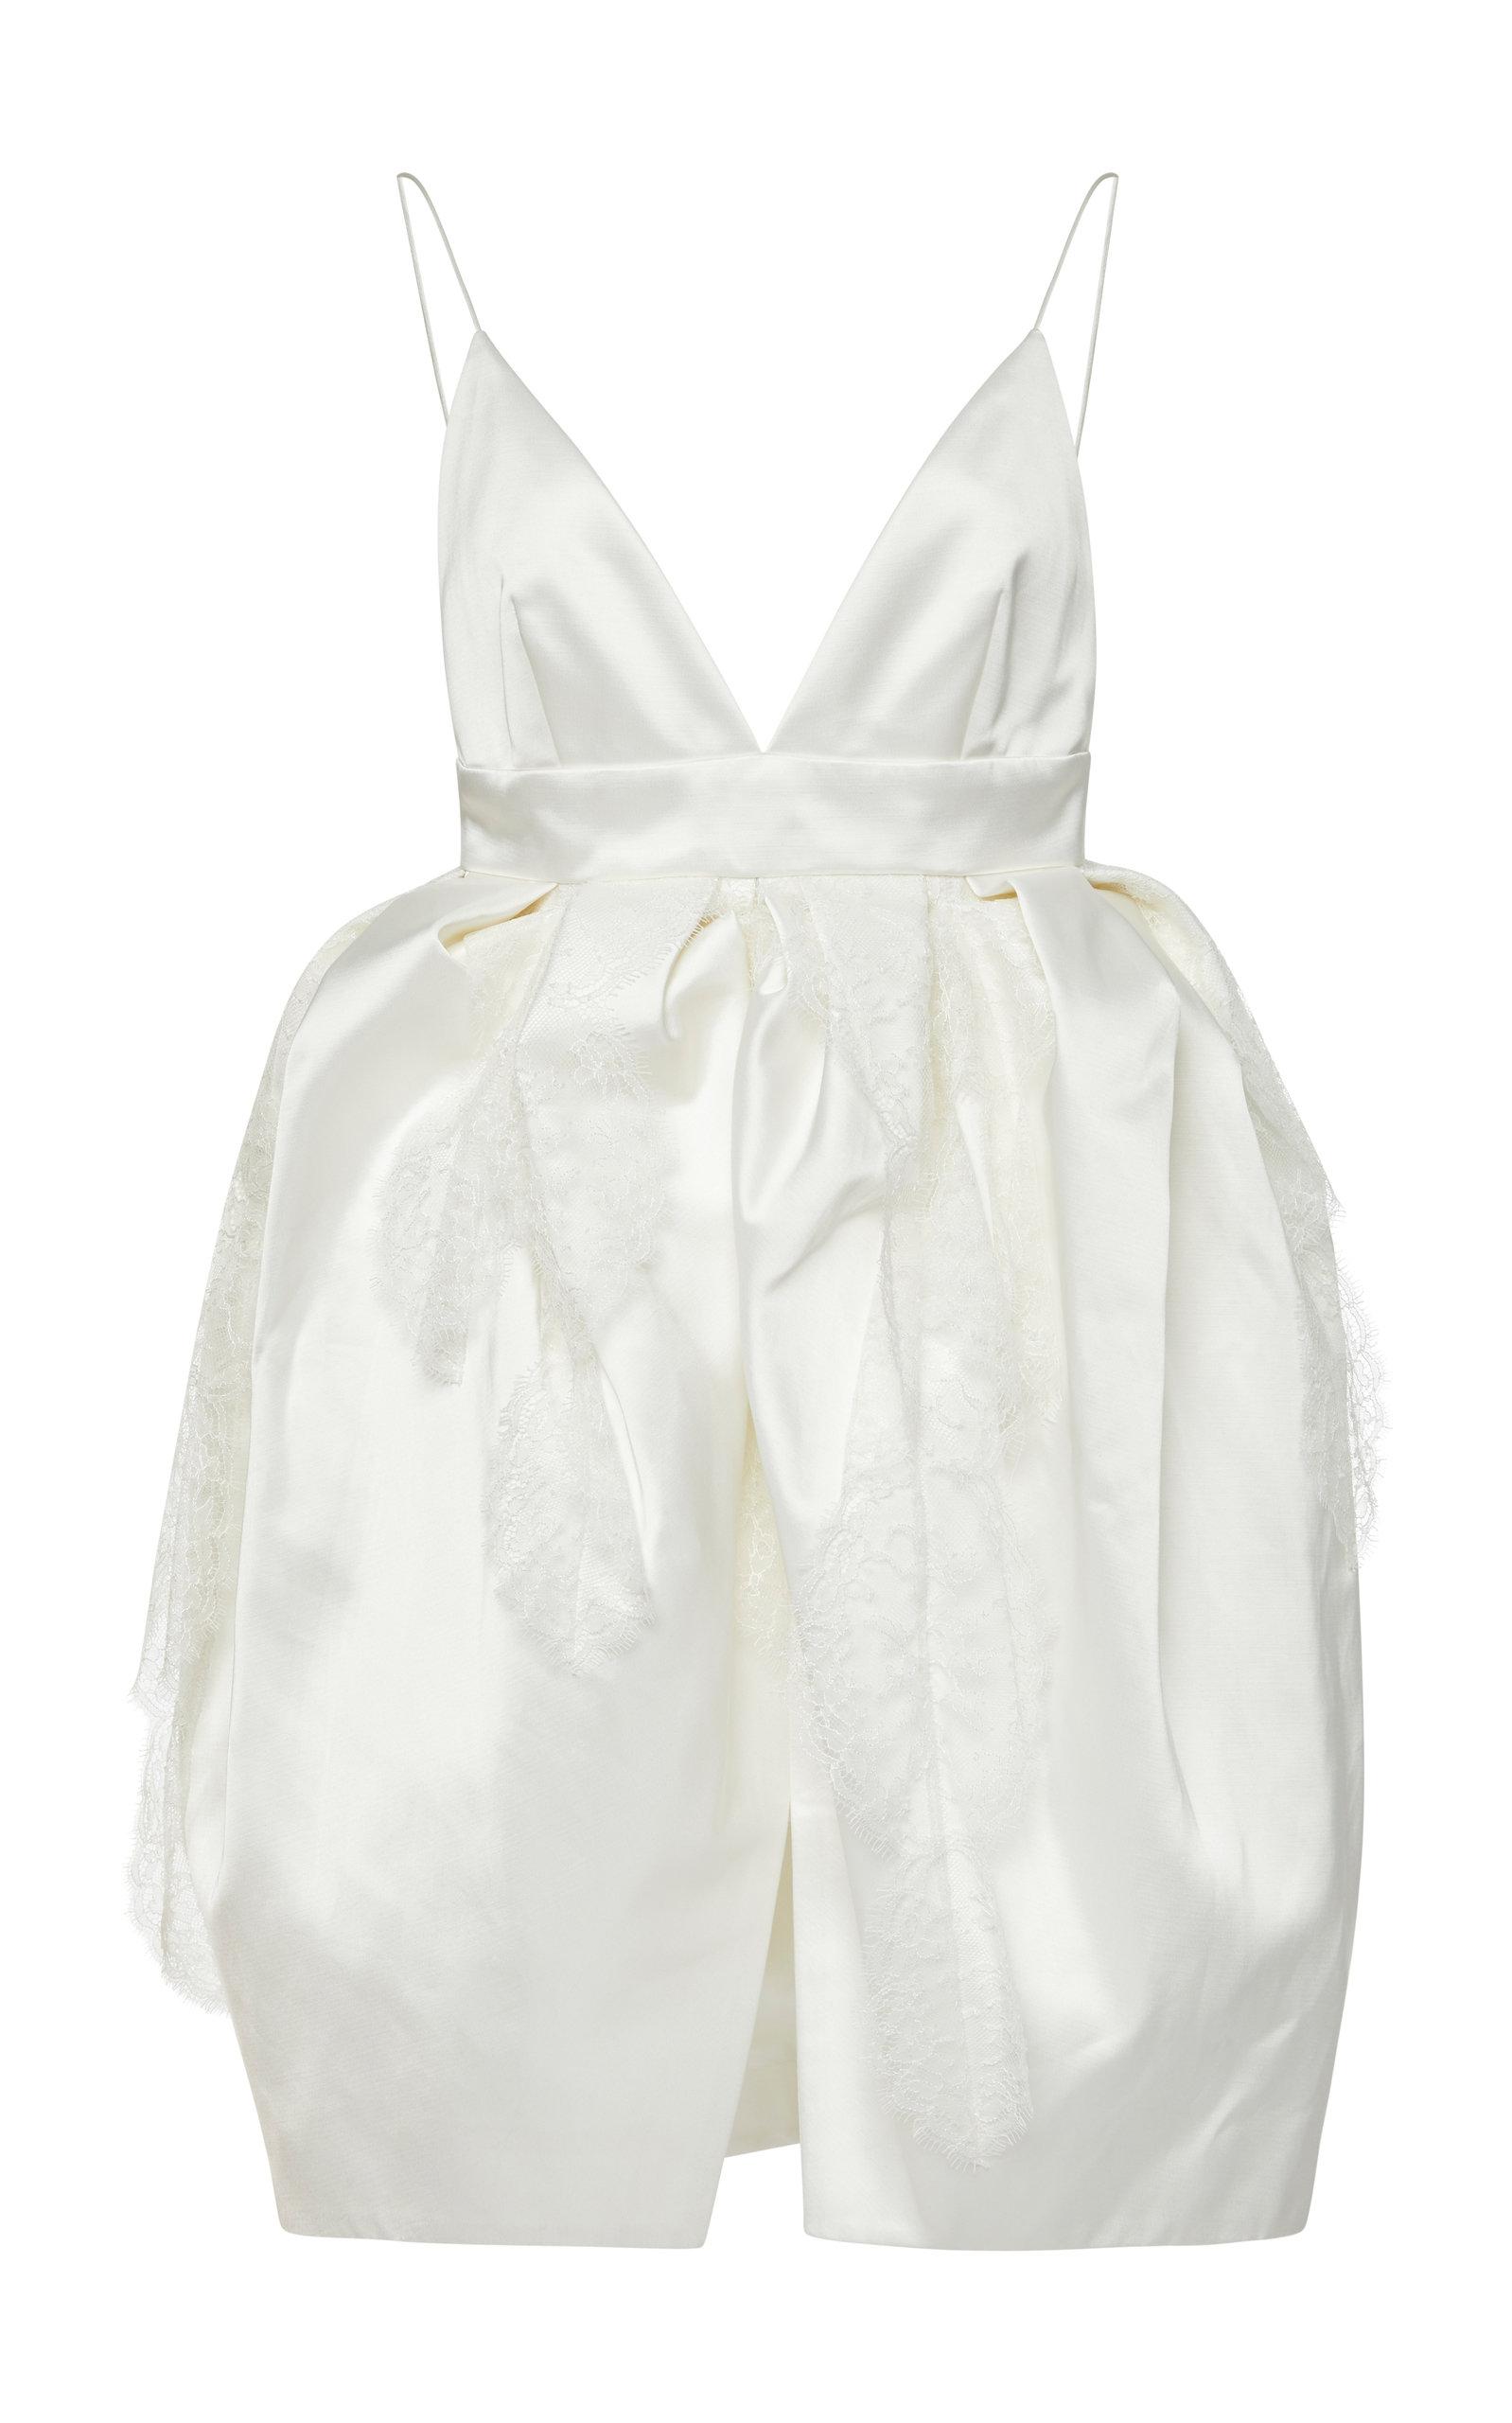 DANIELLE FRANKEL BRIDAL Iris Open-Back Gathered Waist Satin Mini Dress in White